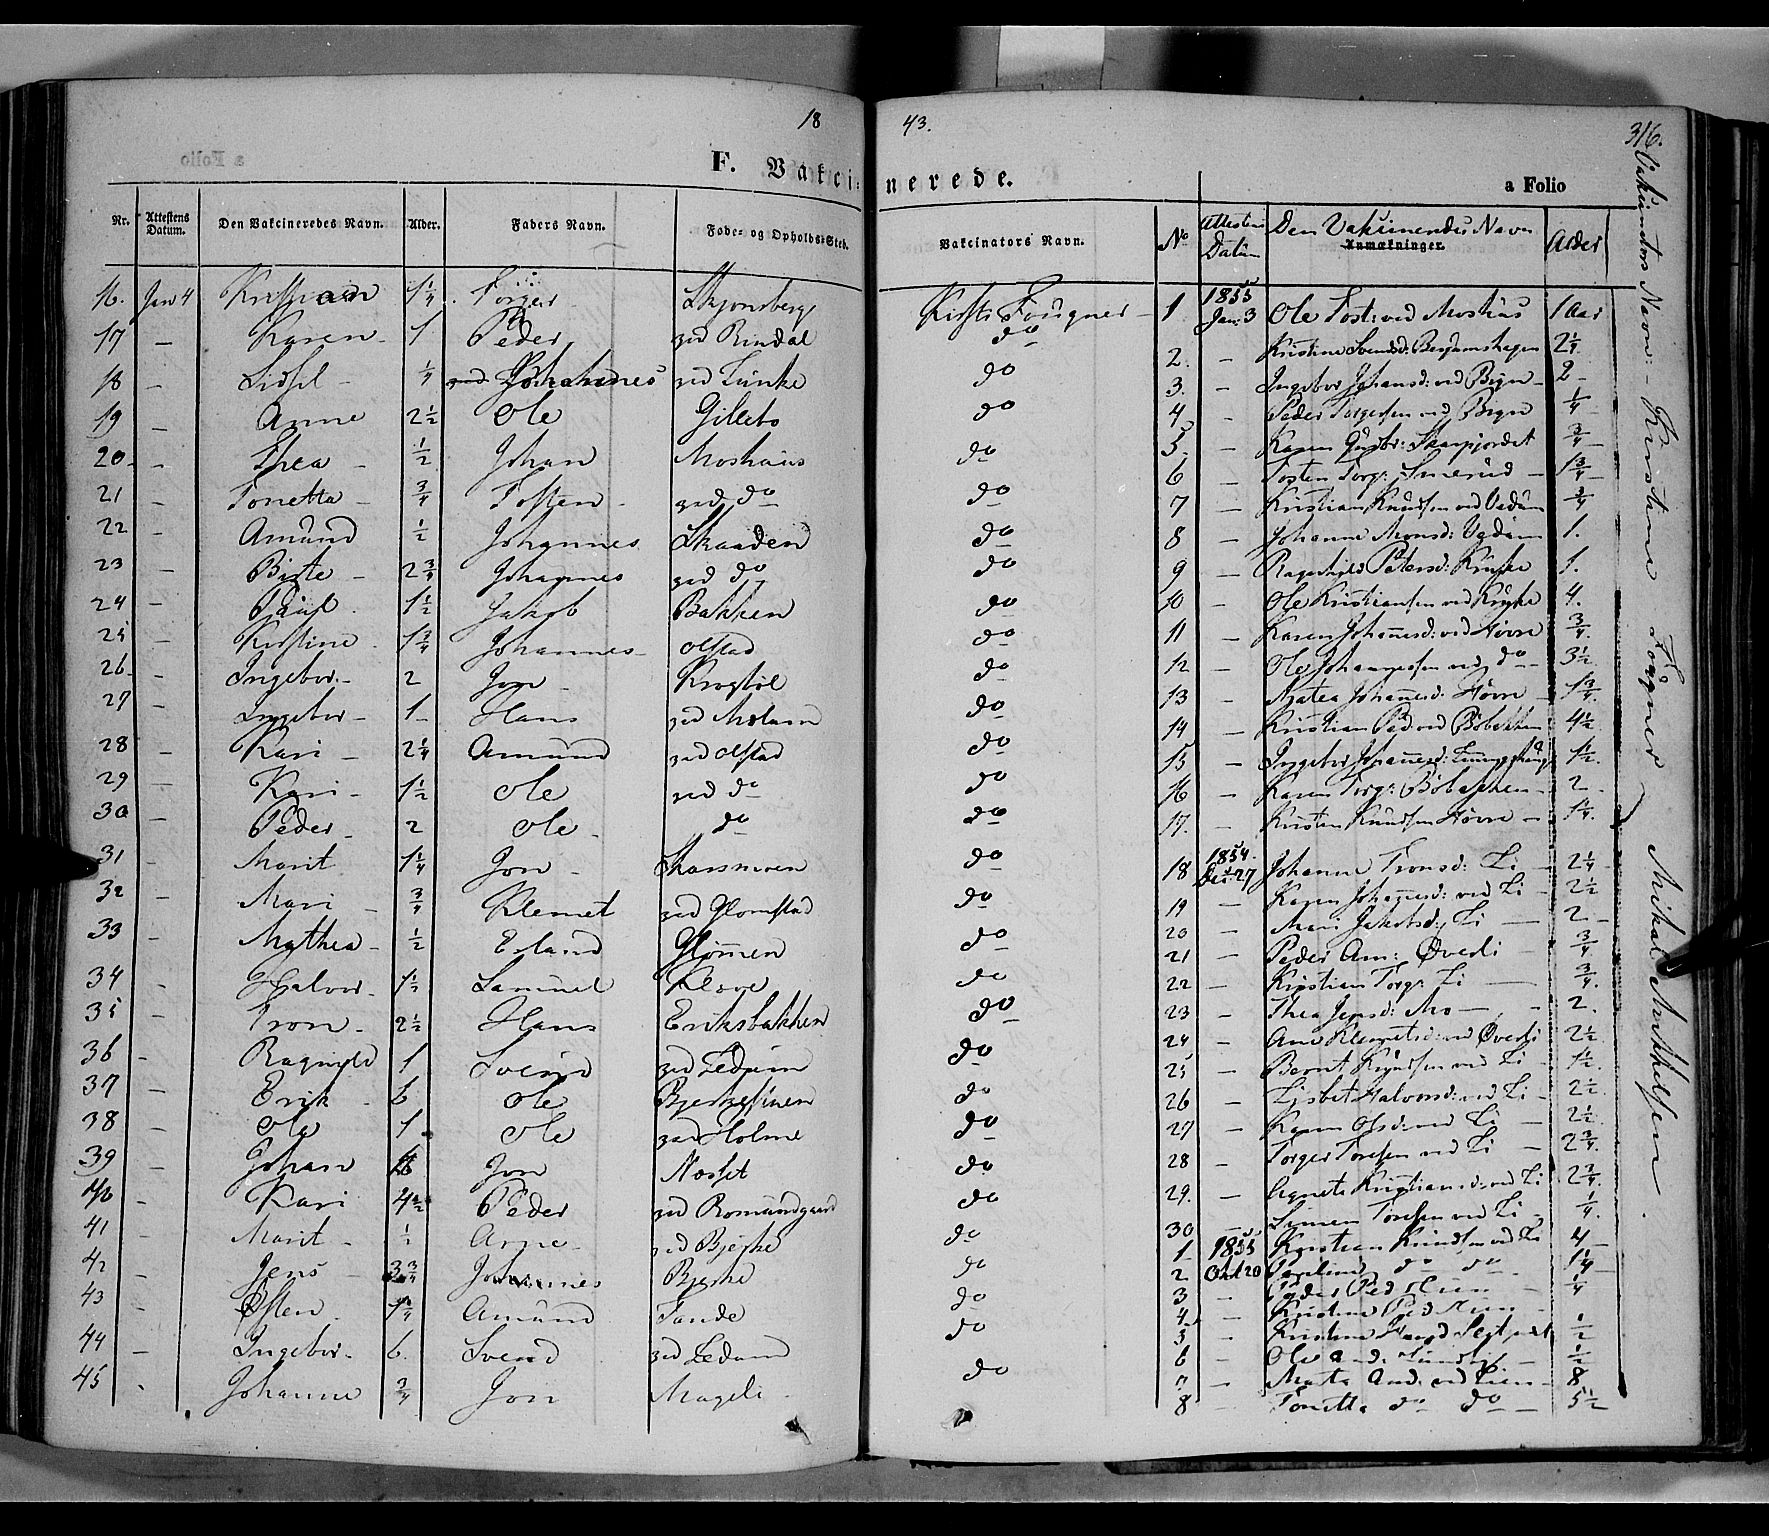 SAH, Øyer prestekontor, Ministerialbok nr. 5, 1842-1857, s. 316